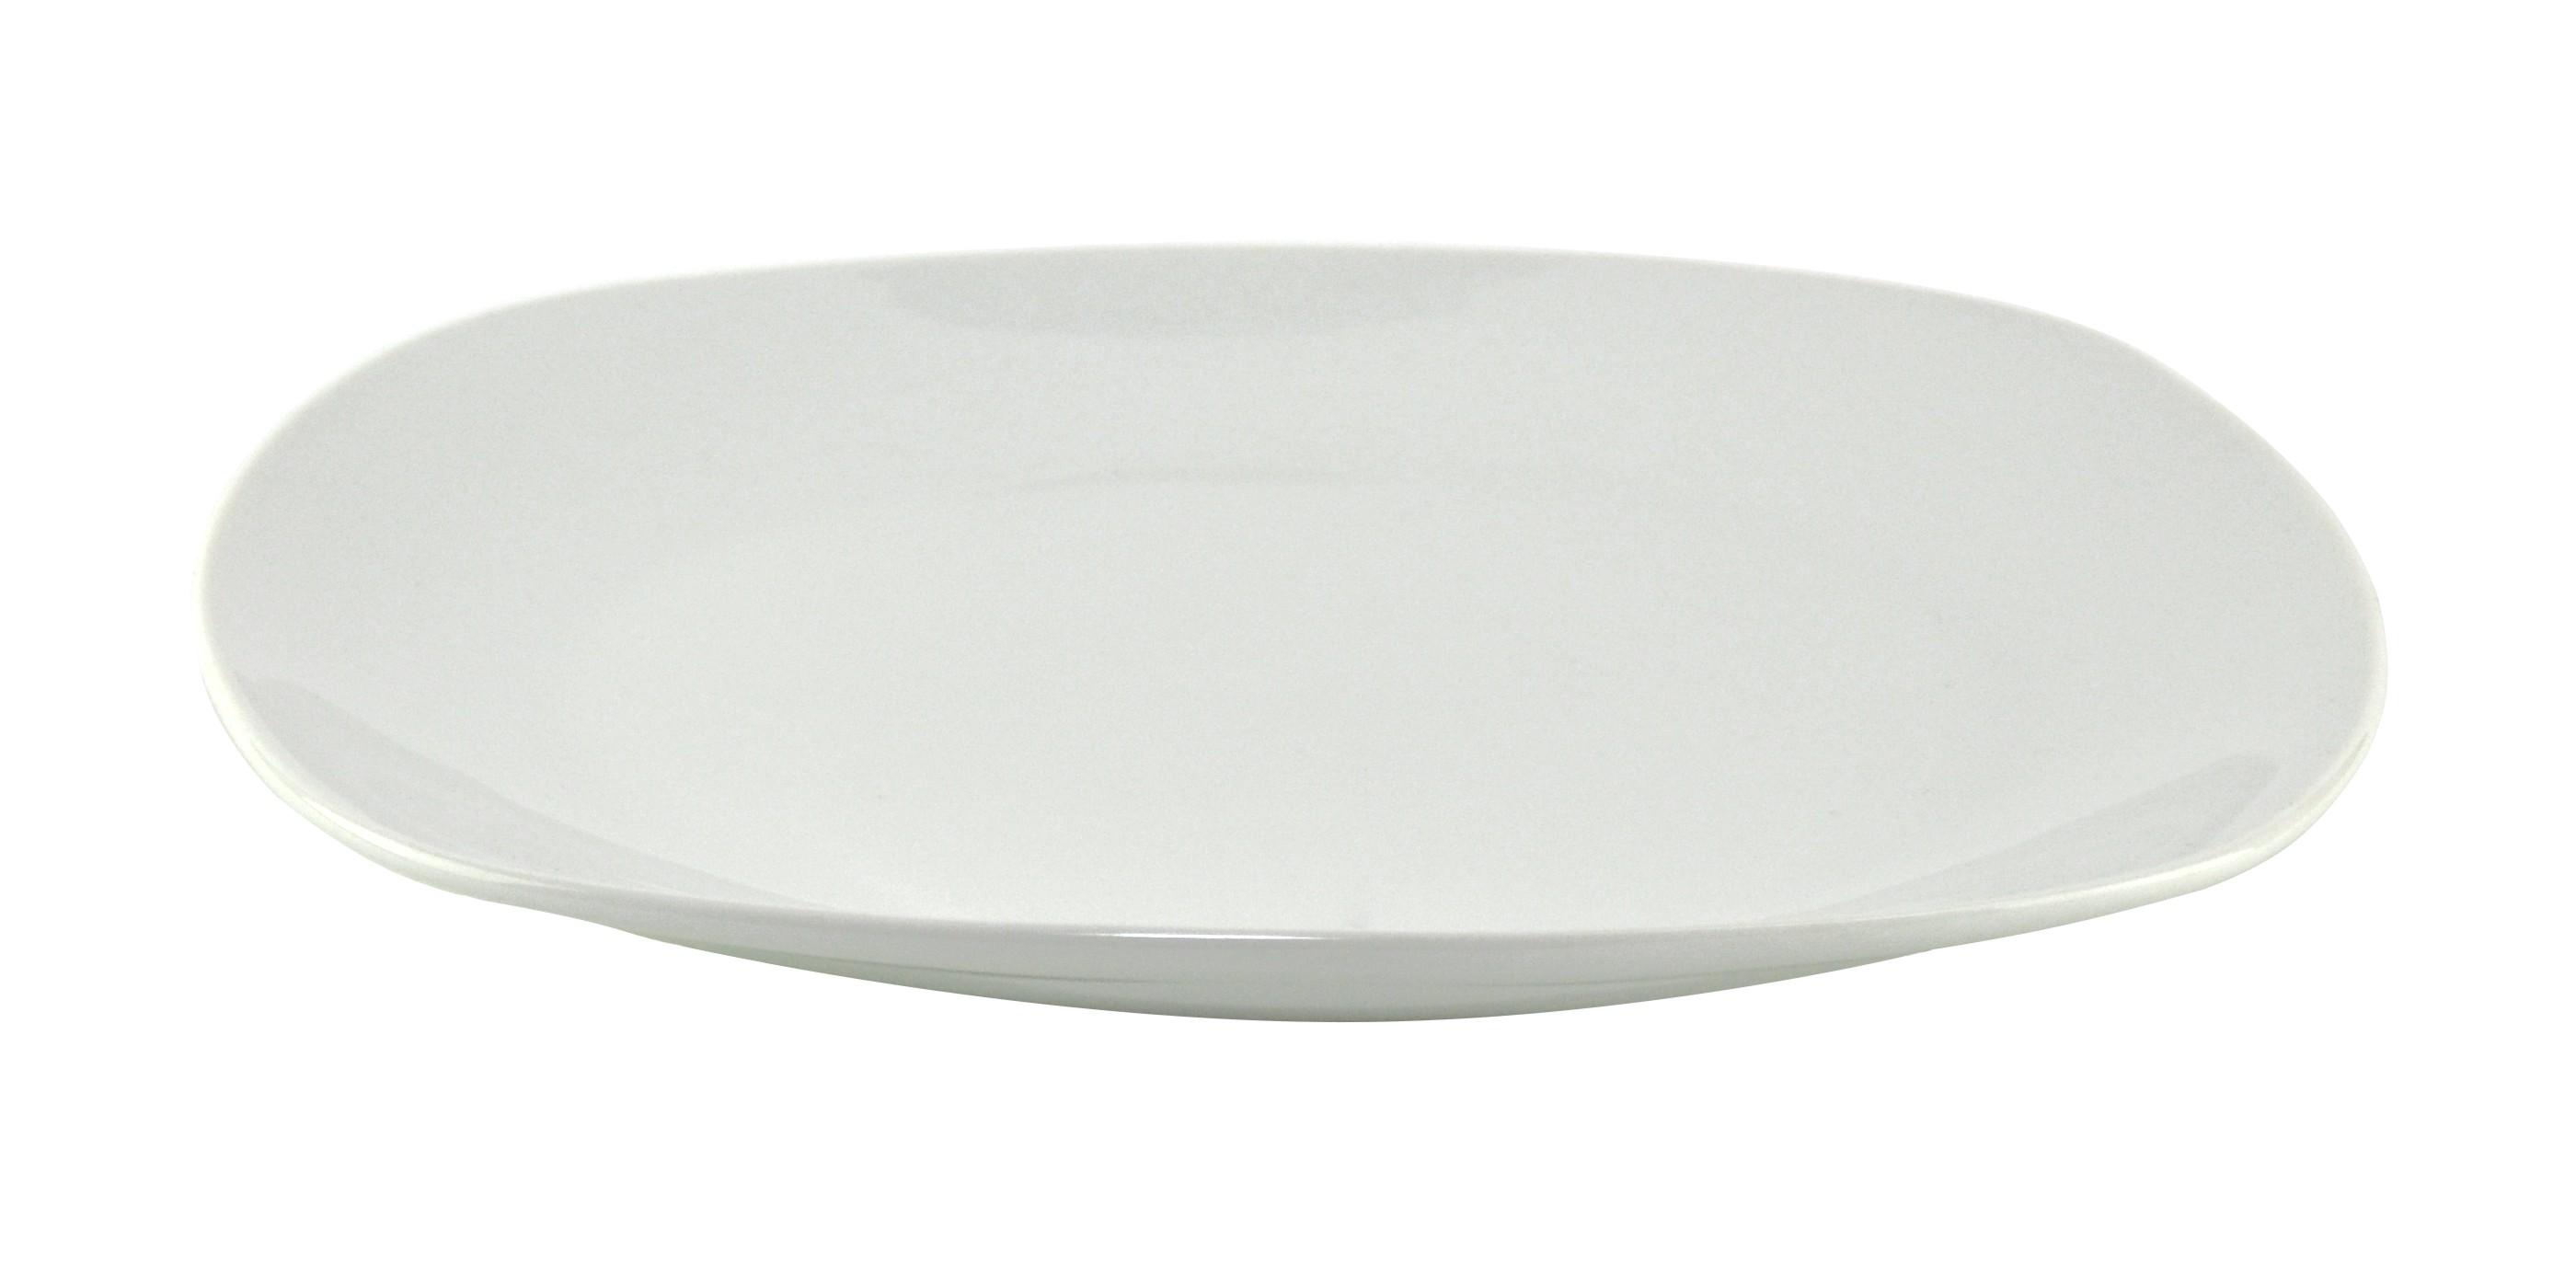 tafelservice atrium 12tlg f r 6 personen porzellan tafelservice ohne dekor. Black Bedroom Furniture Sets. Home Design Ideas